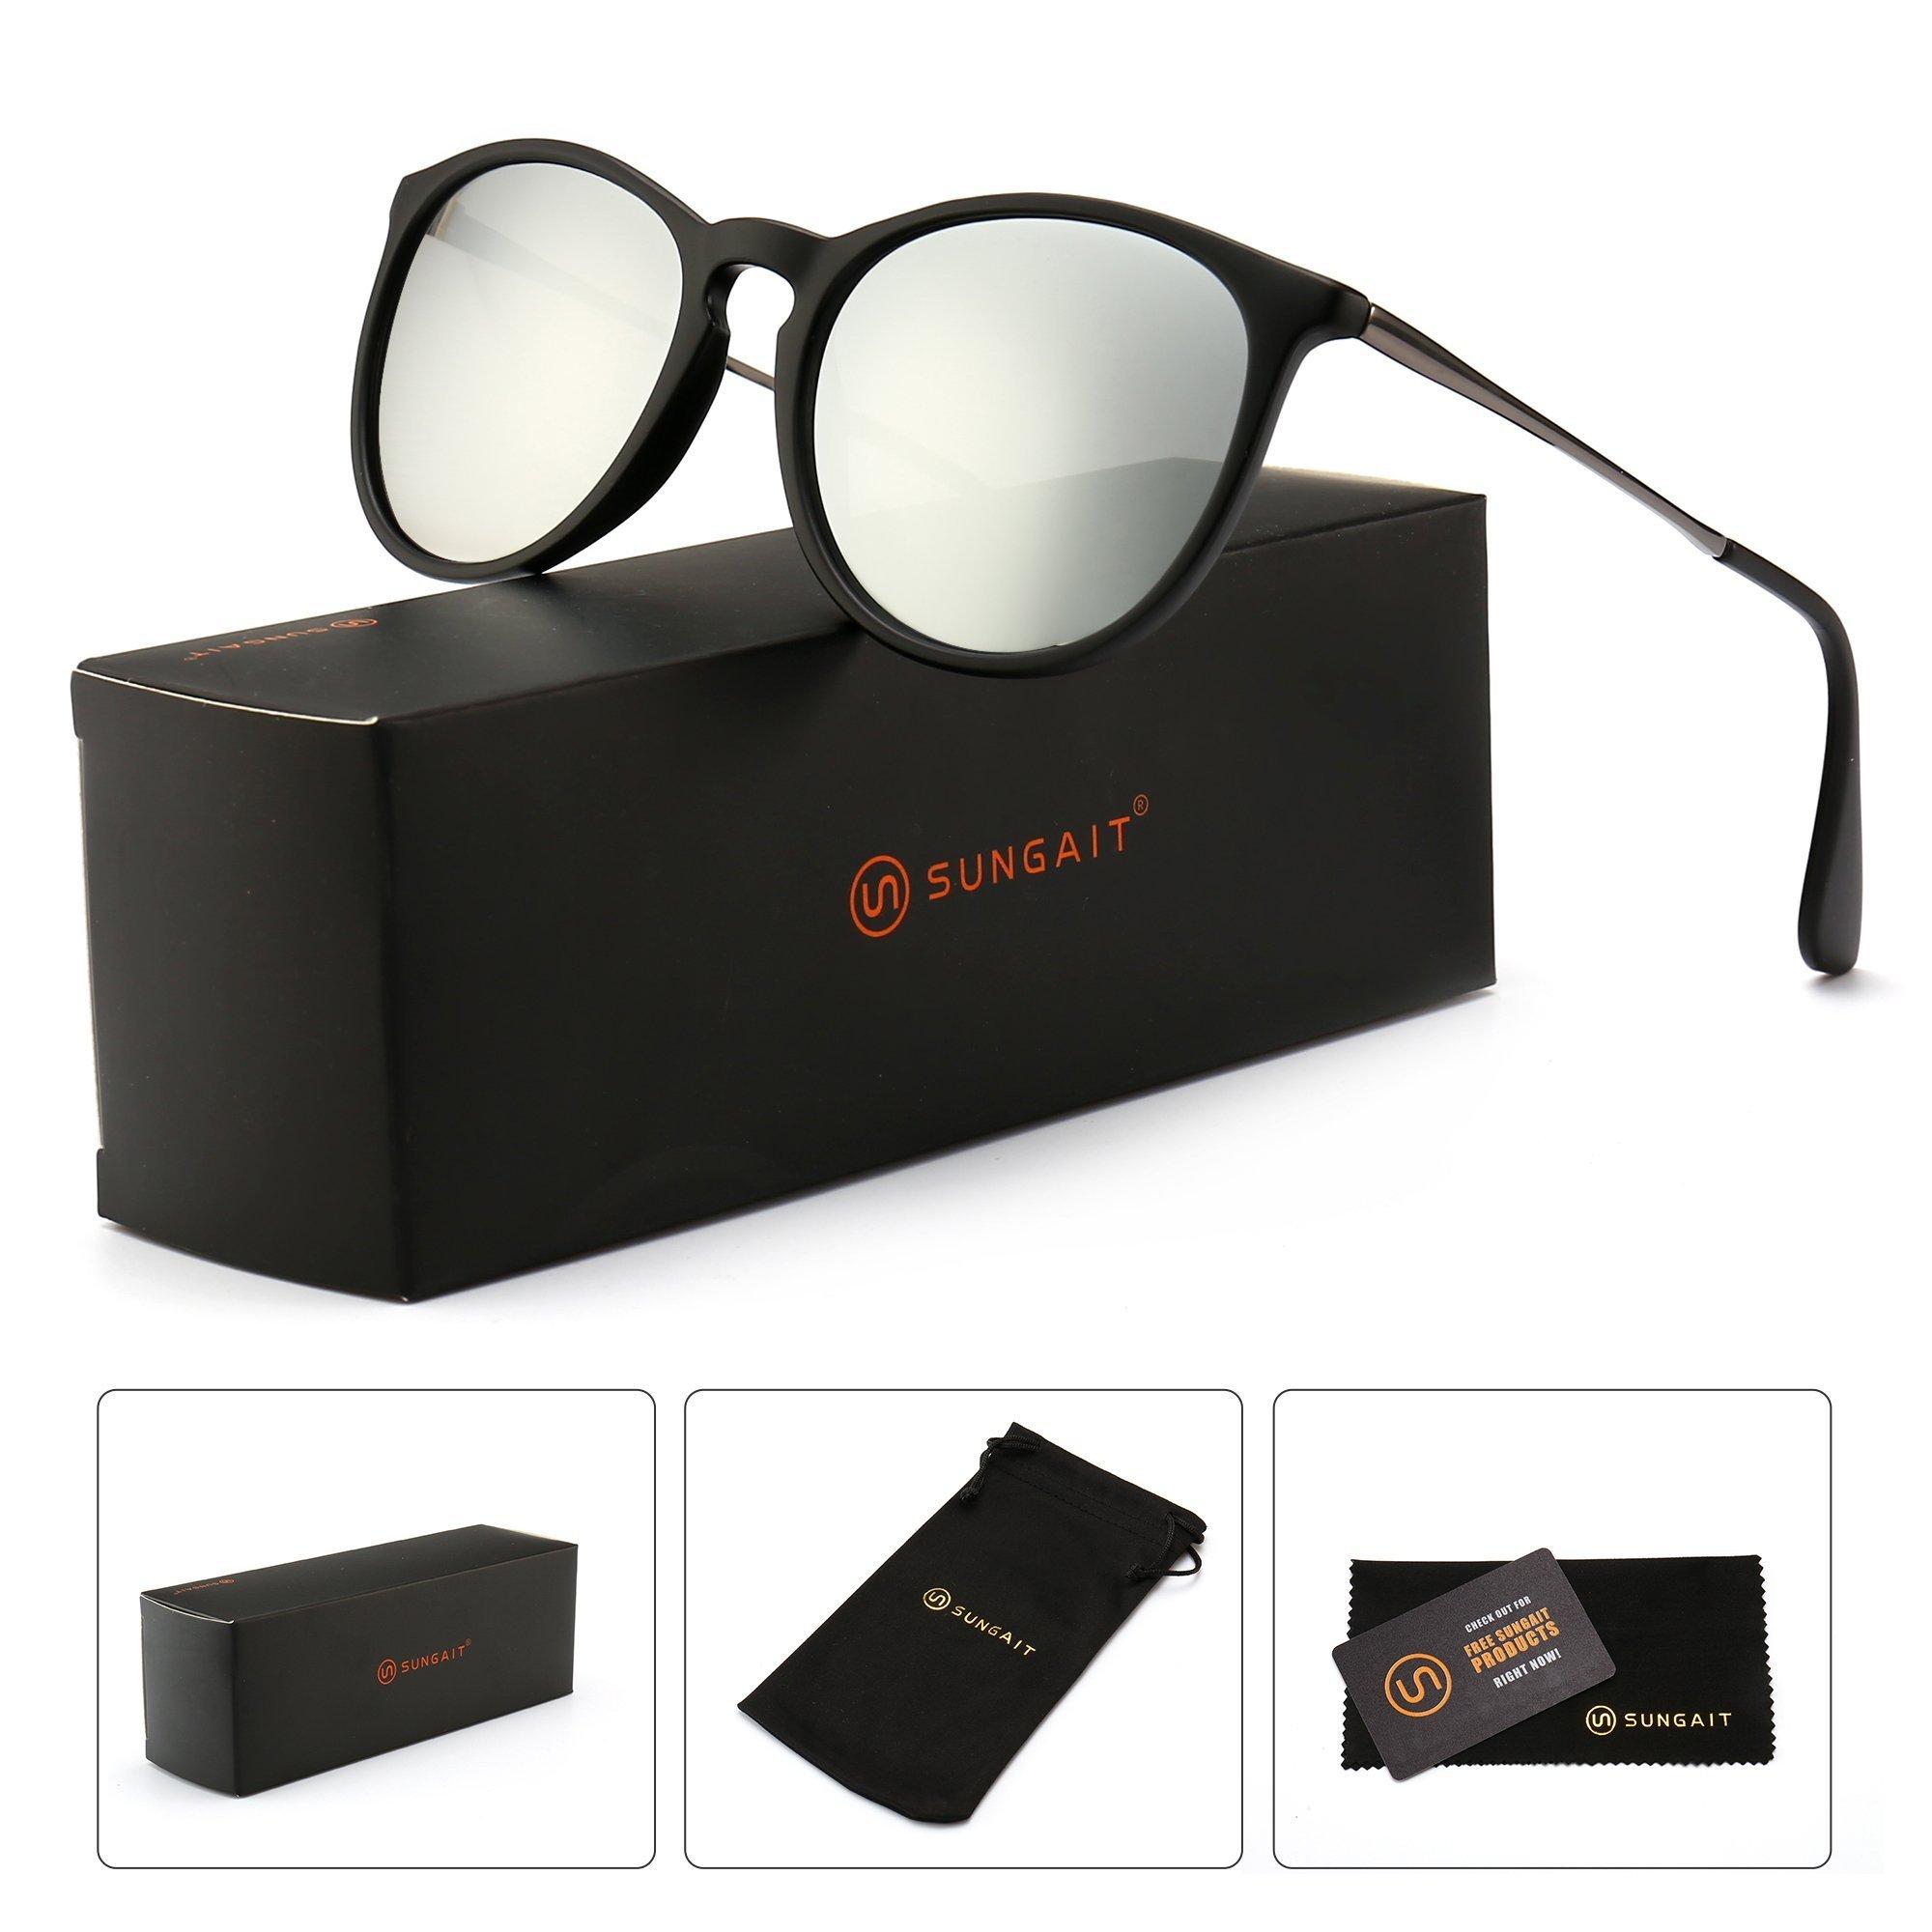 SUNGAIT Vintage Round Sunglasses for Women Classic Retro Designer Style (Black Frame Matte Finish/Sliver Lens) 1567 SHKSY